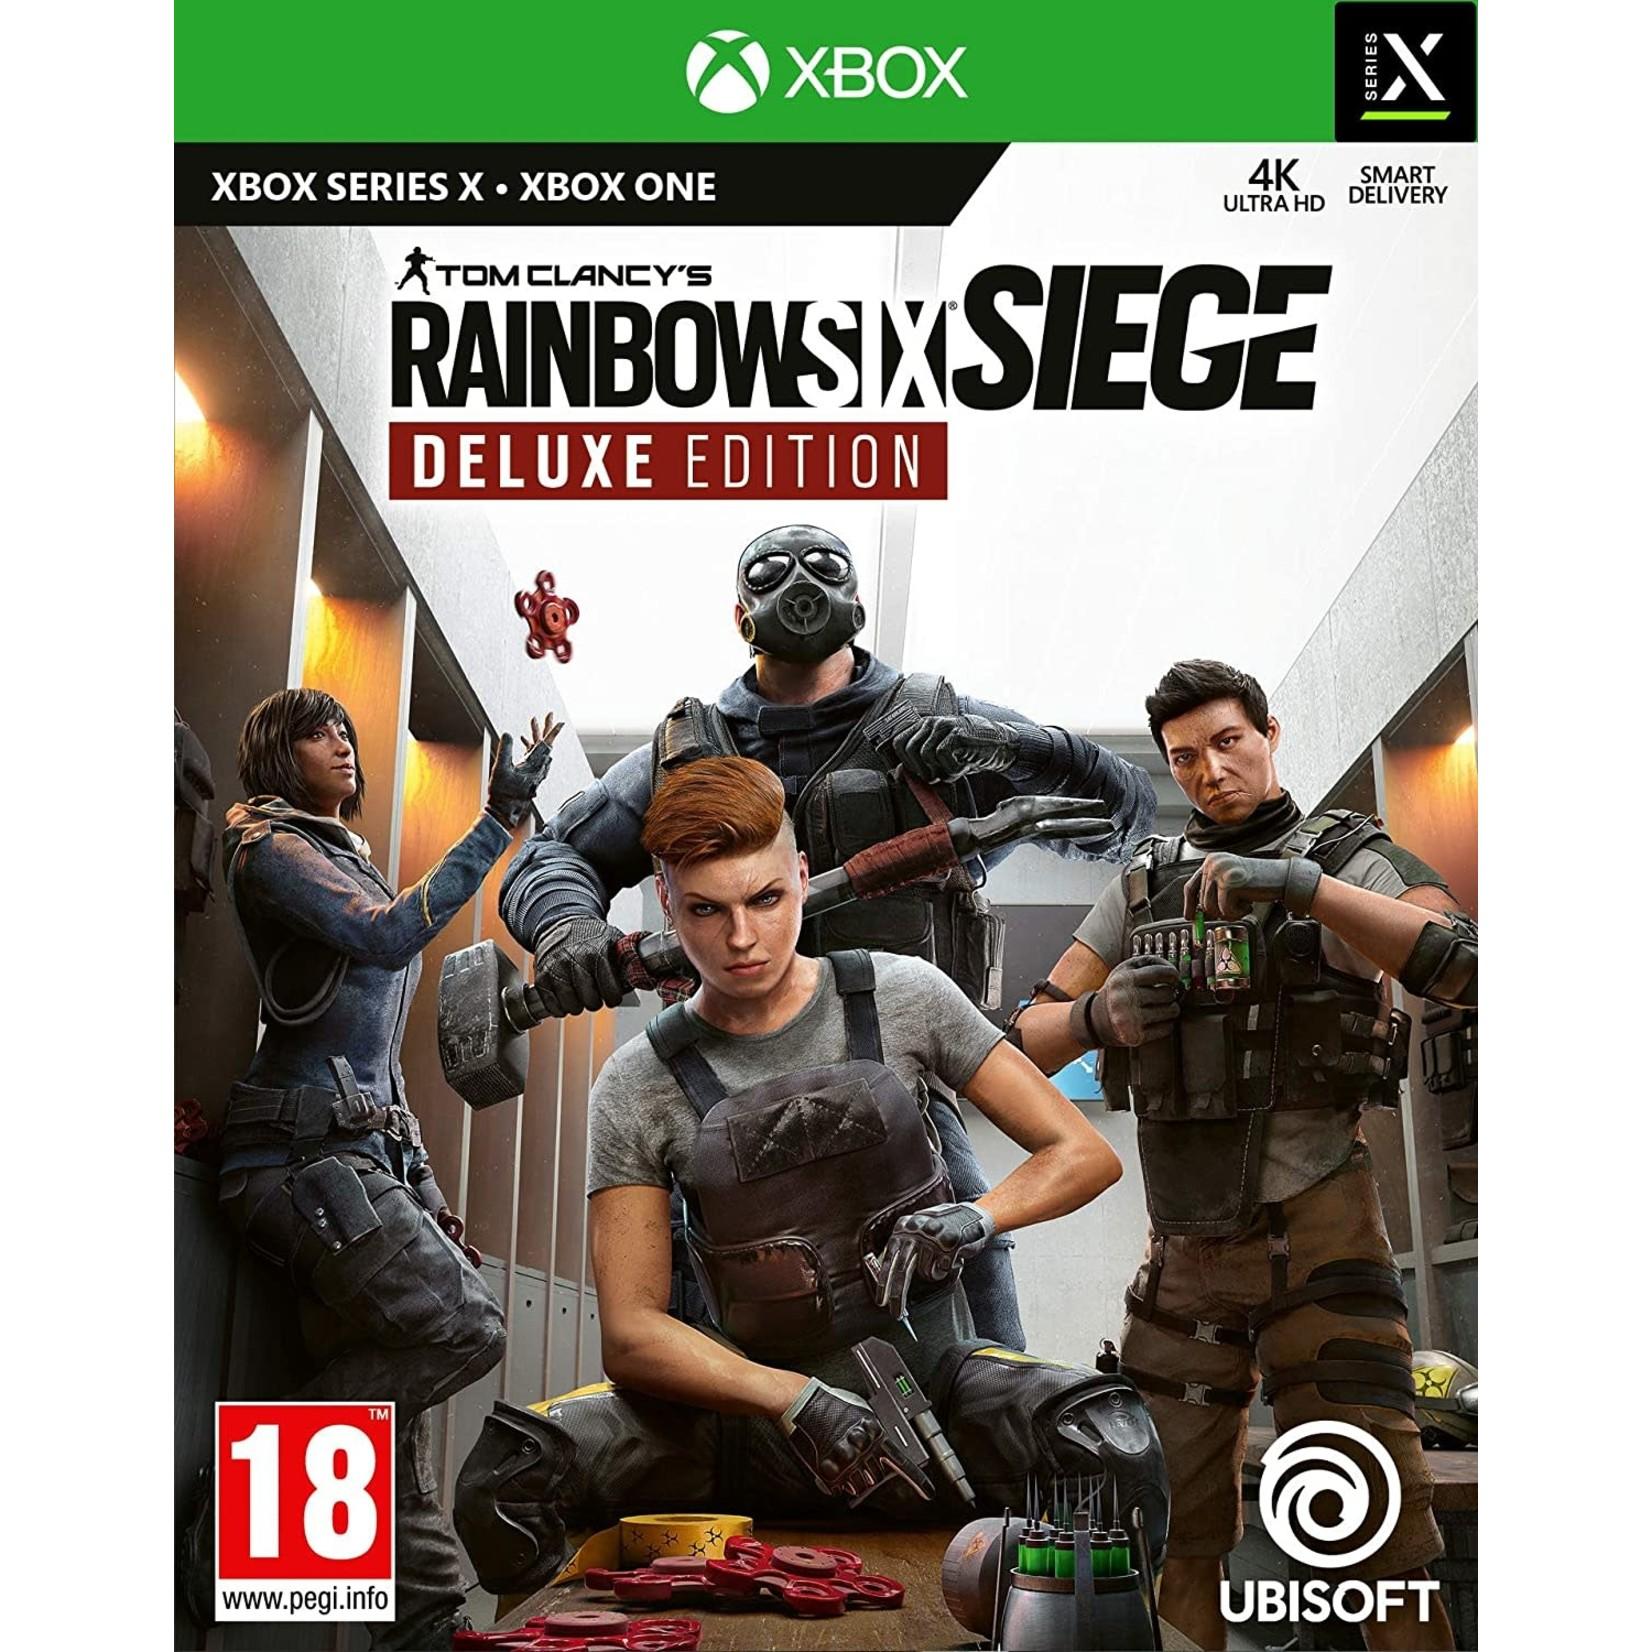 xB1-Tom Clancy's Rainbow Six Siege Deluxe Edition